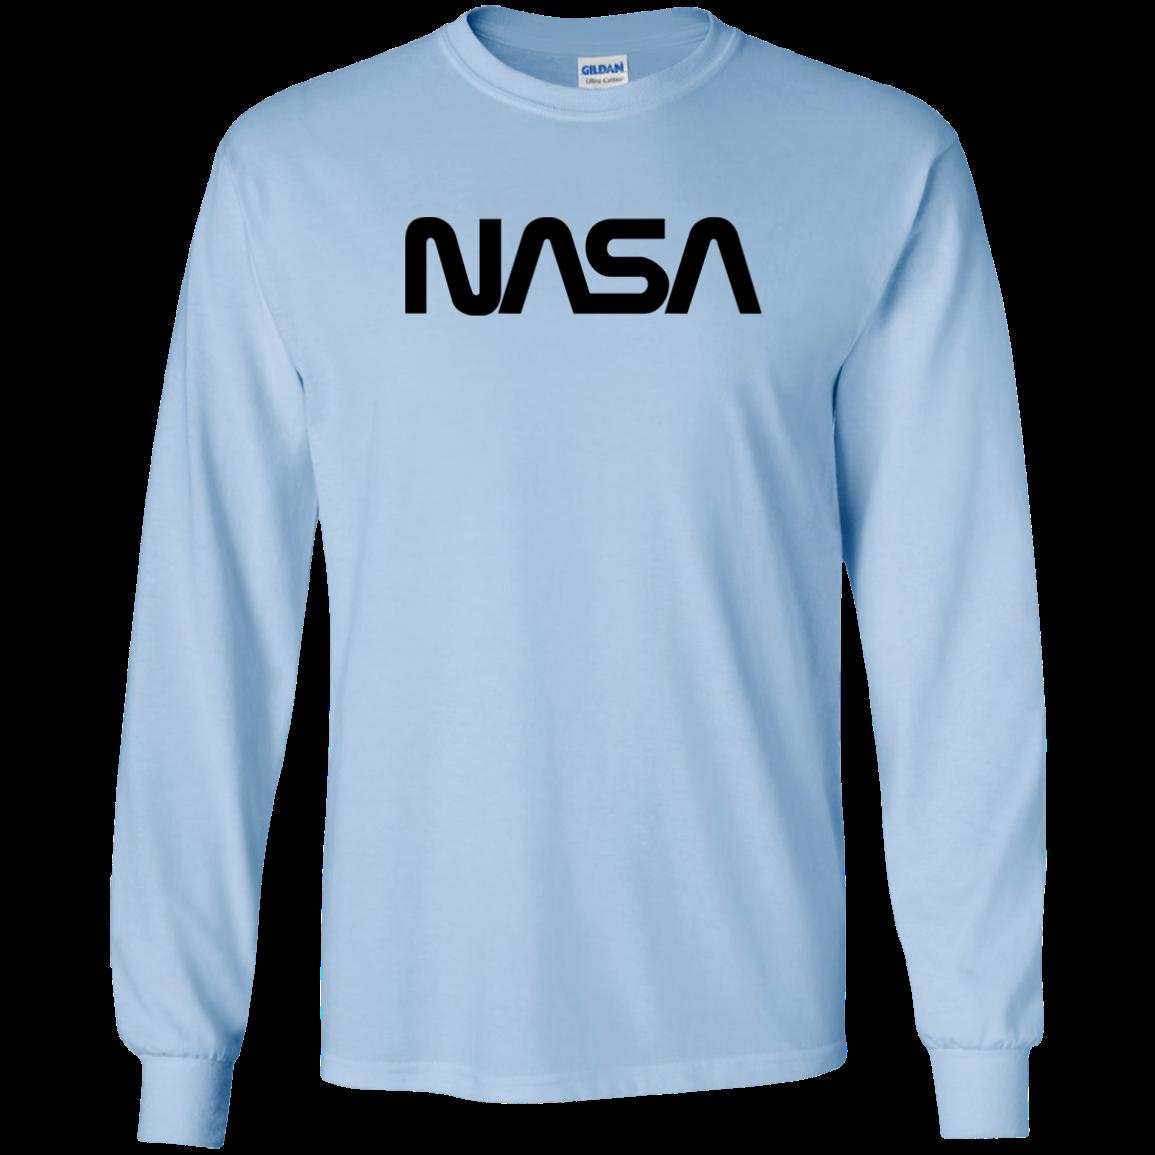 Drunkin Grownups Gildan Long Sleeve Tee T-Shirt